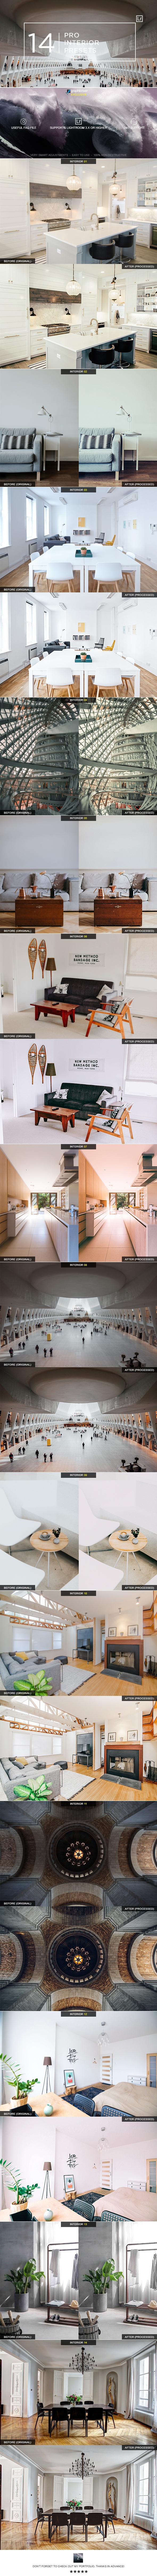 14 Pro Interior Presets - HDR Lightroom Presets